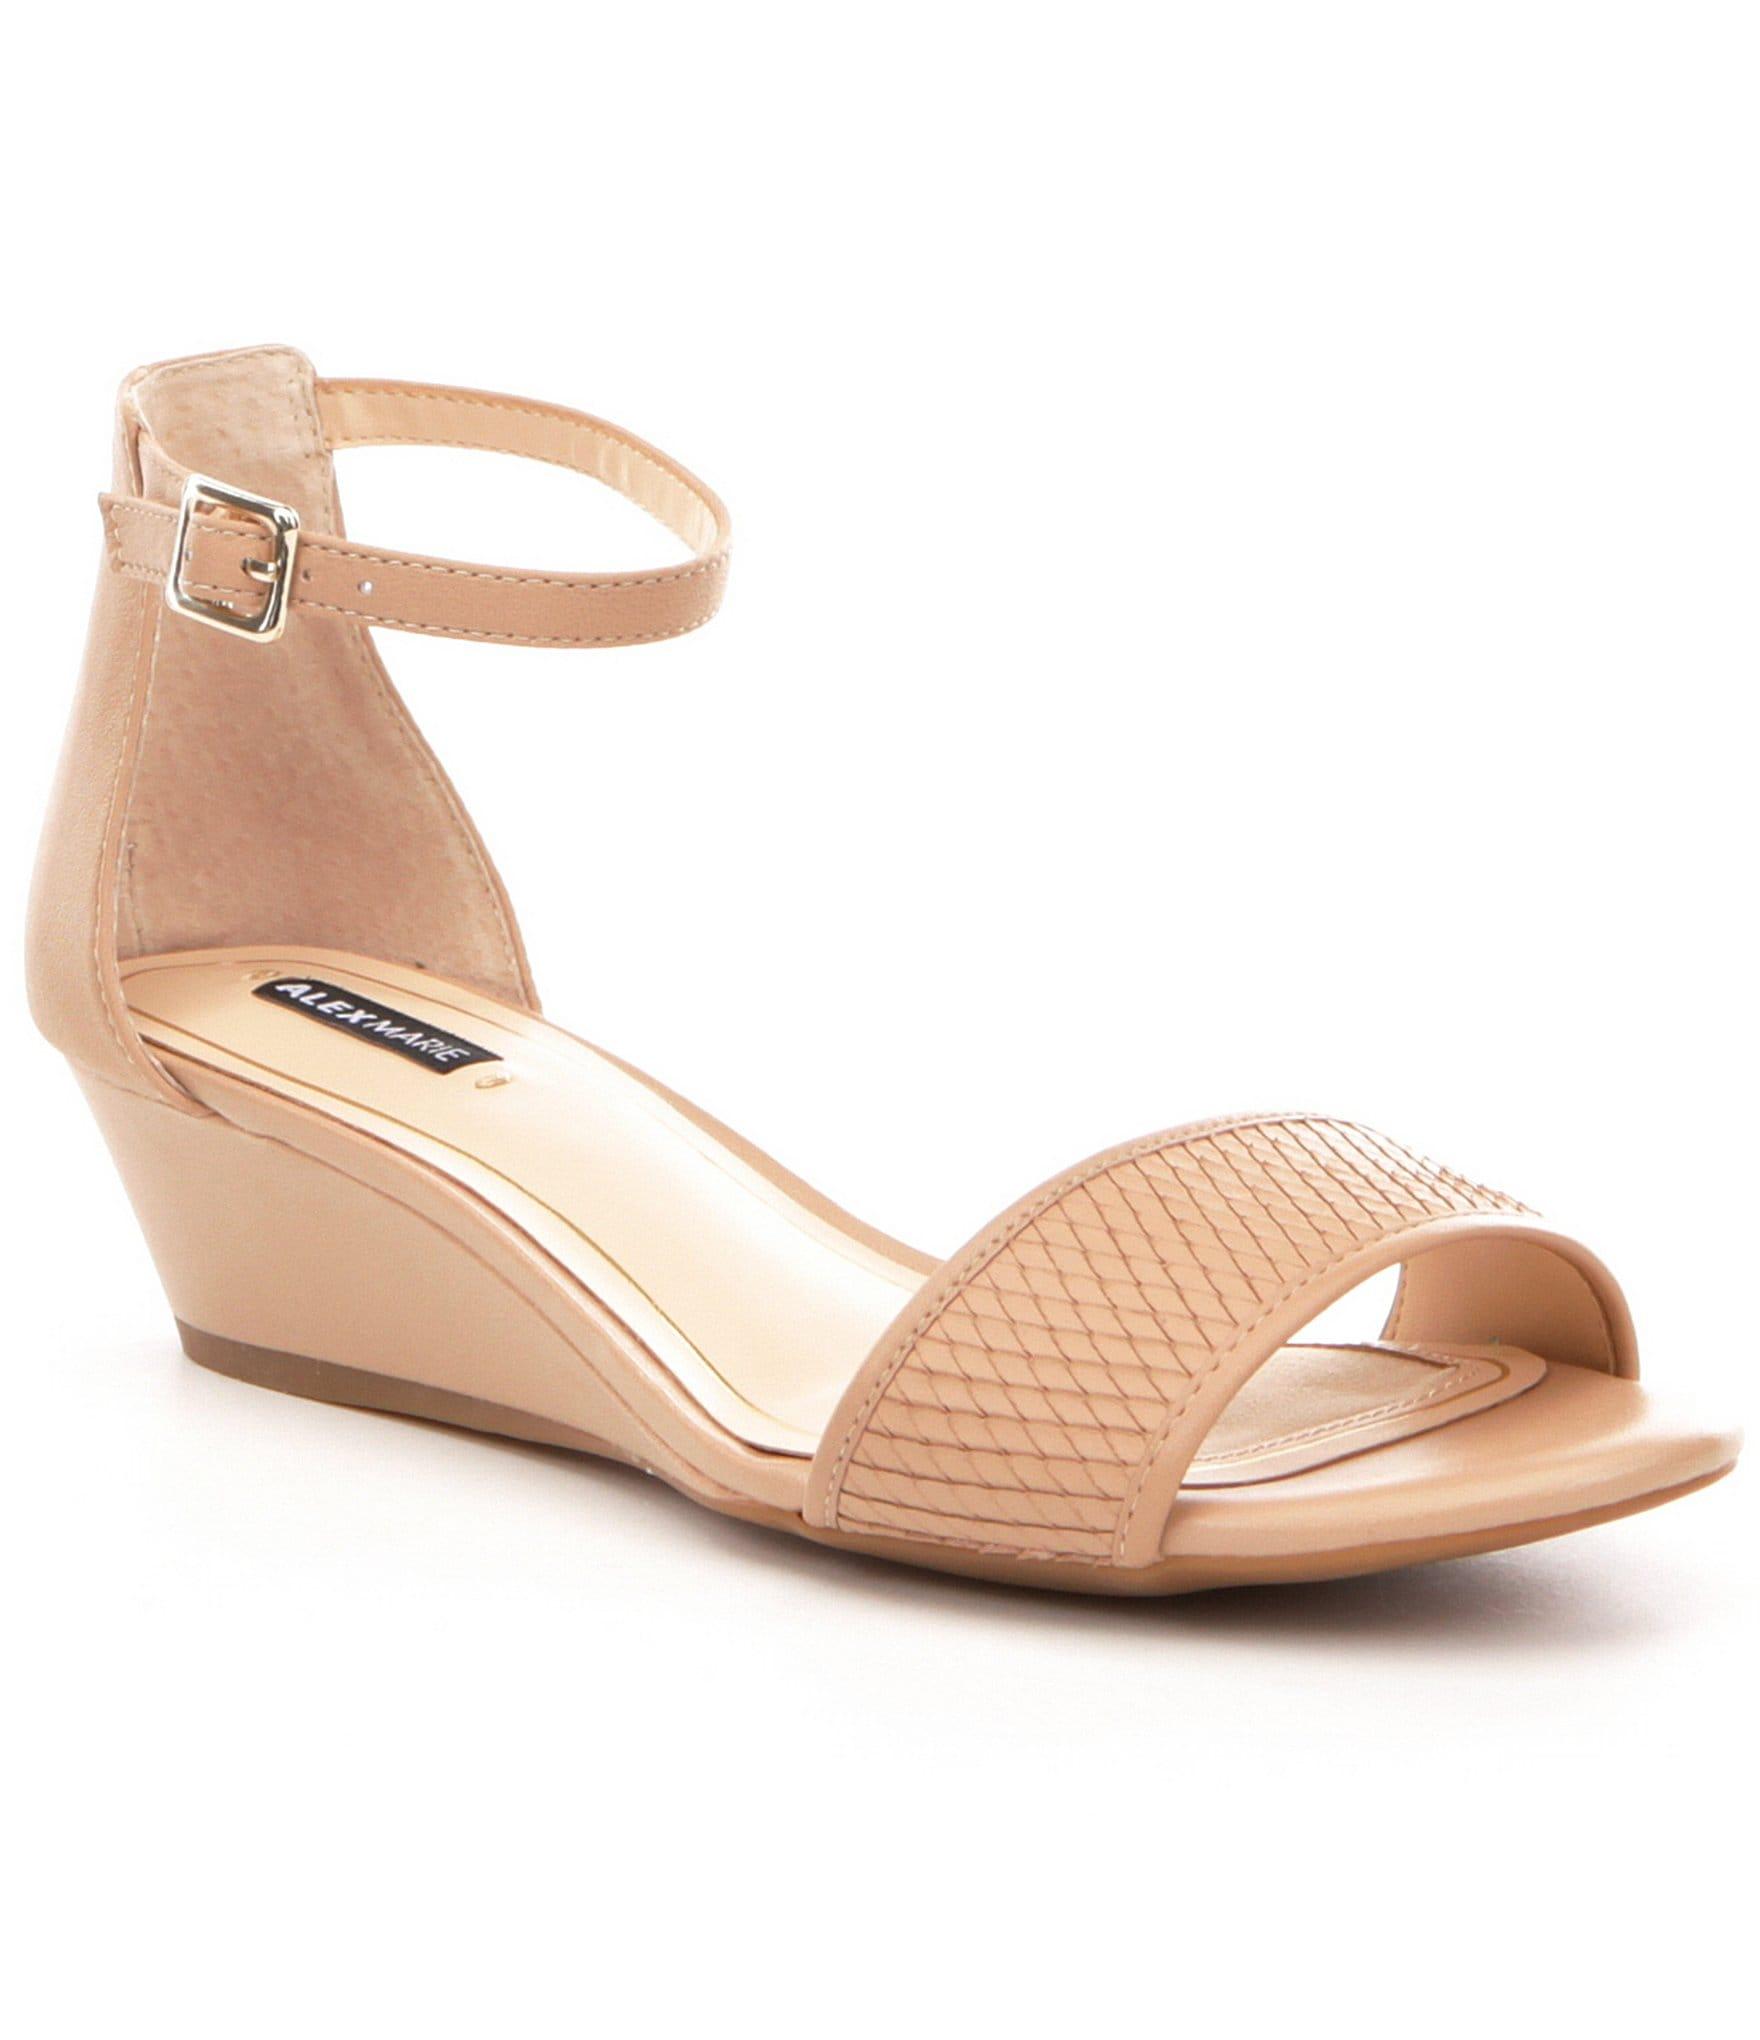 Alex Marie Mairi Leather Wedge Sandals Dillards